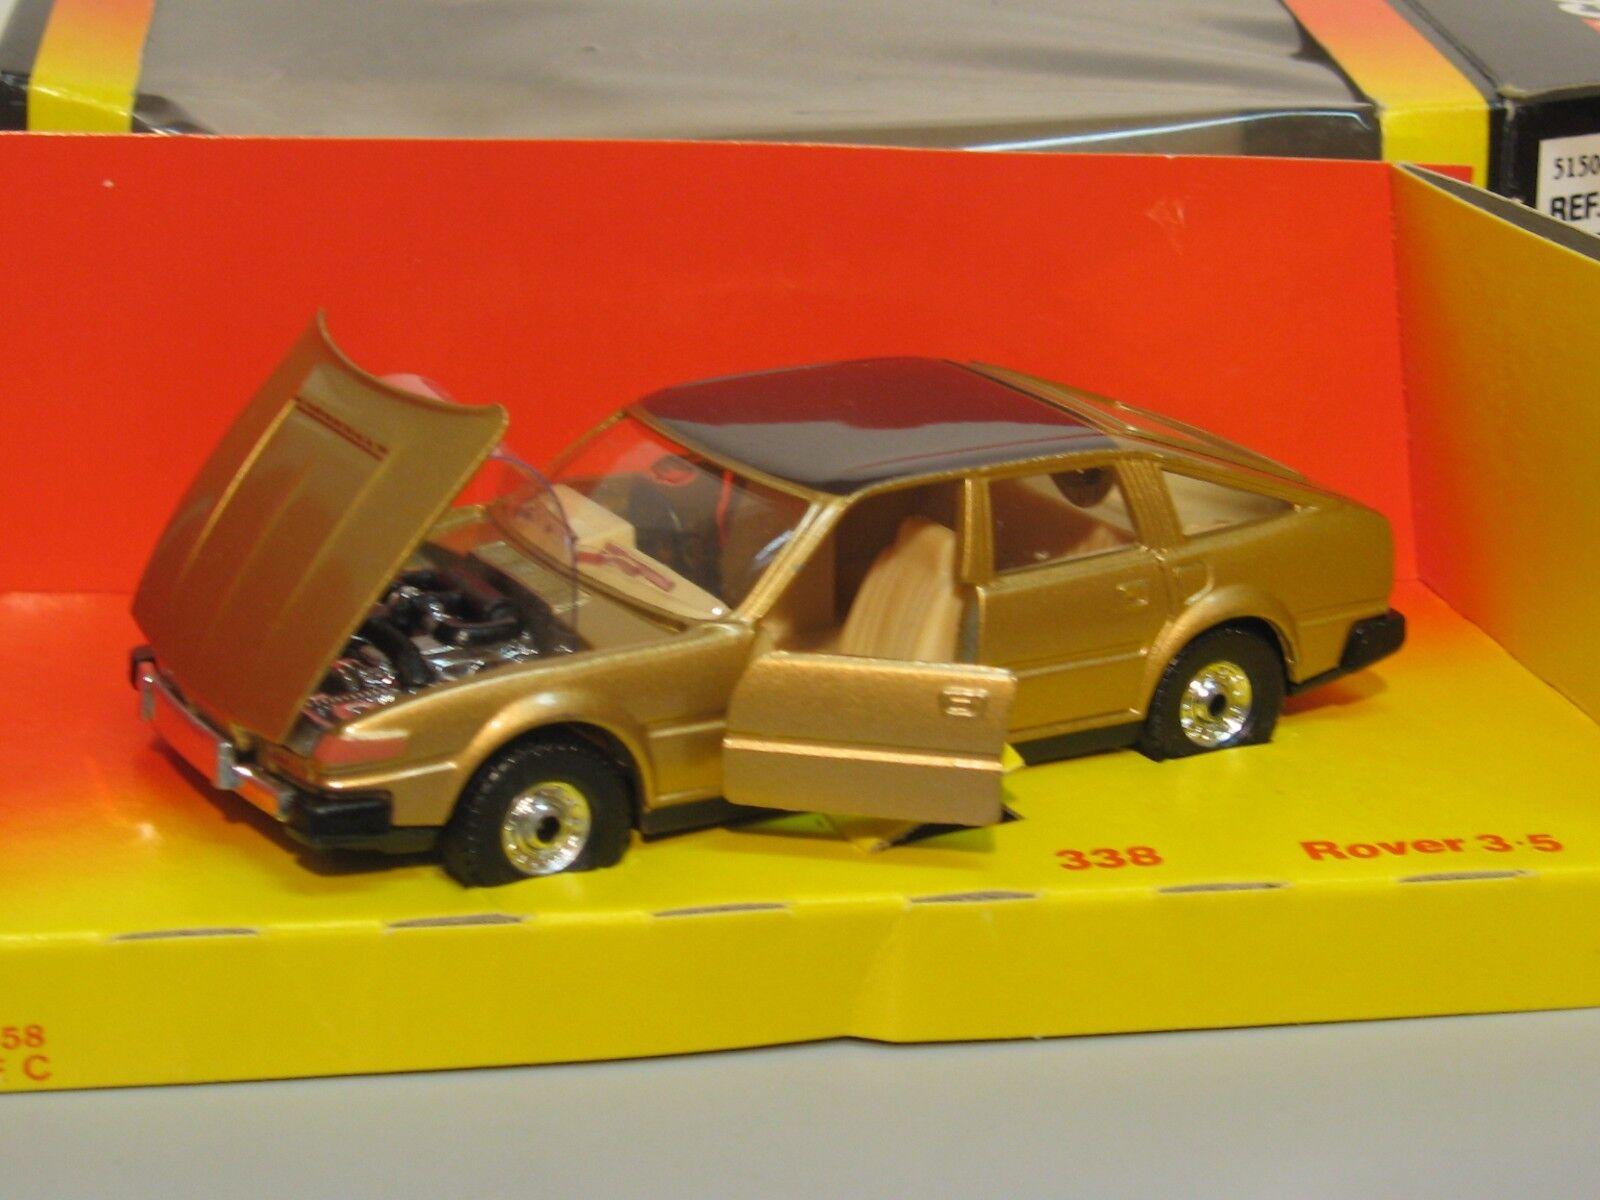 CORGI 338 ROVER SD1 3500 BRONZE 1981 BOITE NEUVE